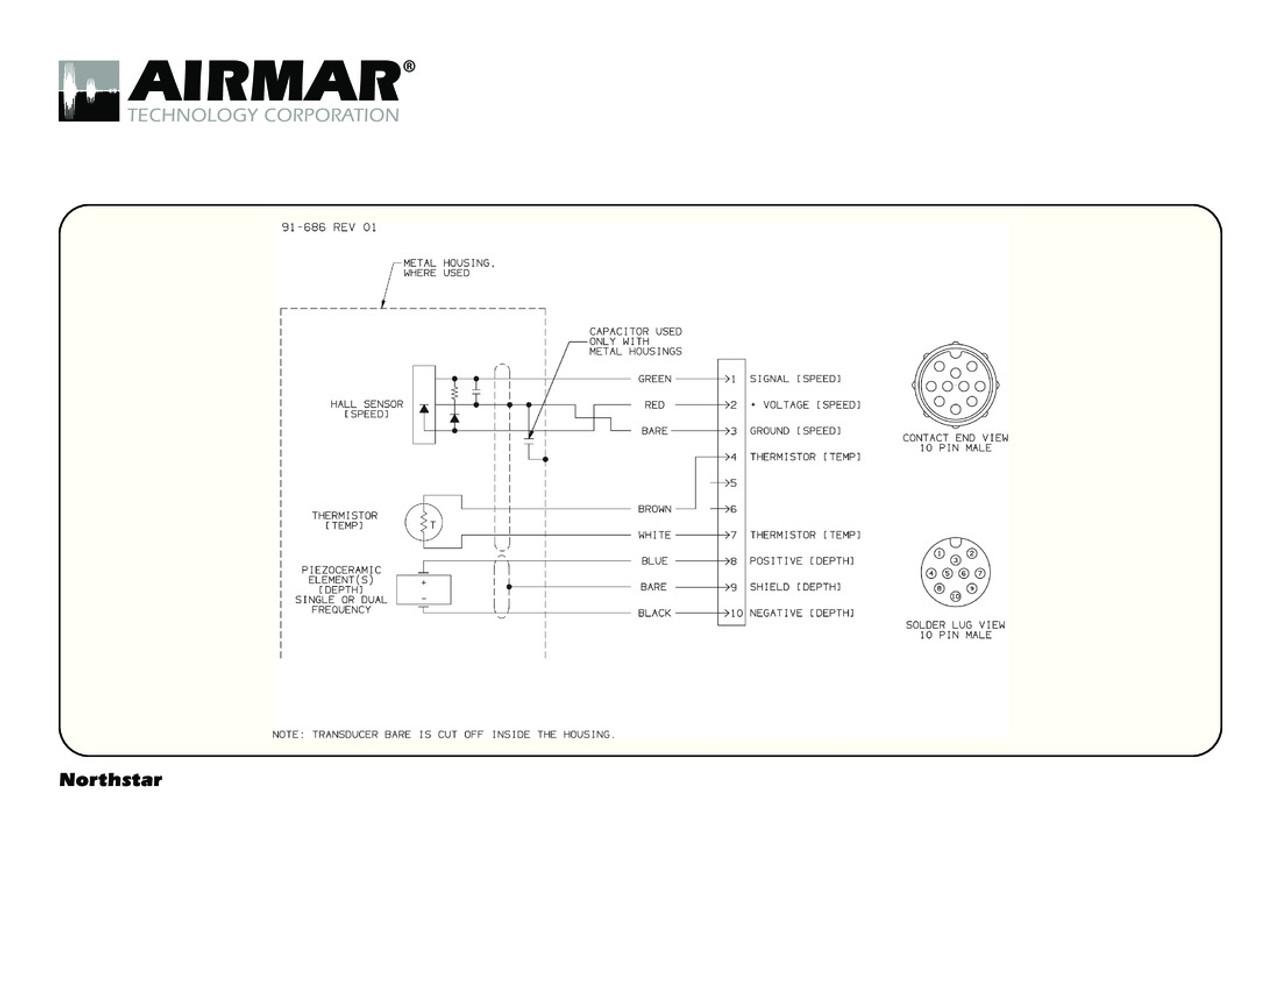 northstar wiring diagram schematics wiring diagrams u2022 rh sierrahullfestival com Magneto Wiring-Diagram Dixie Narco Wiring-Diagram